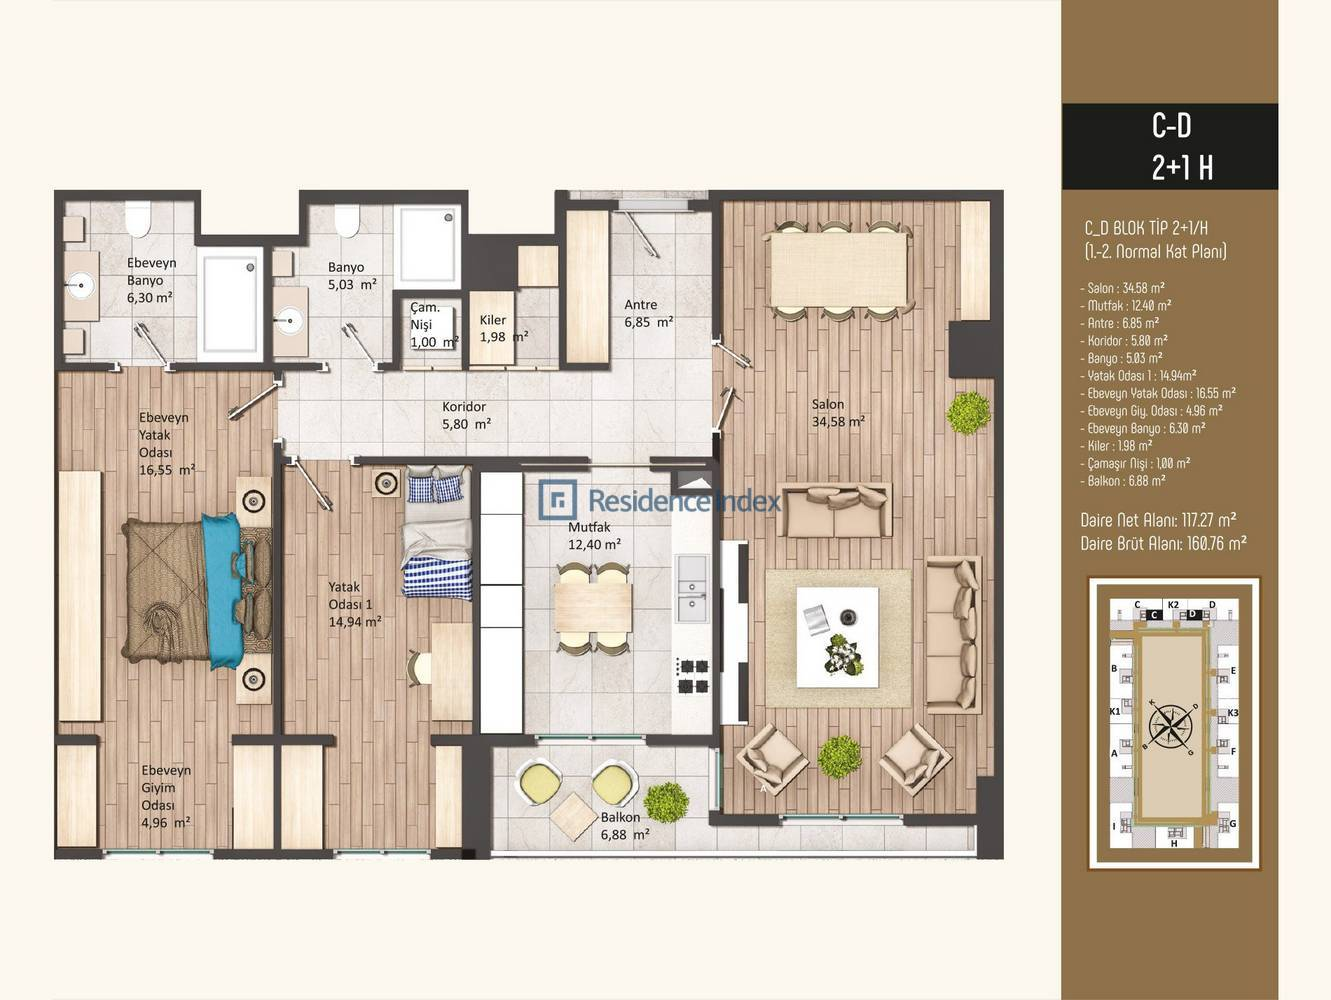 Kameroğlu Metrohome Residence 2+1 H